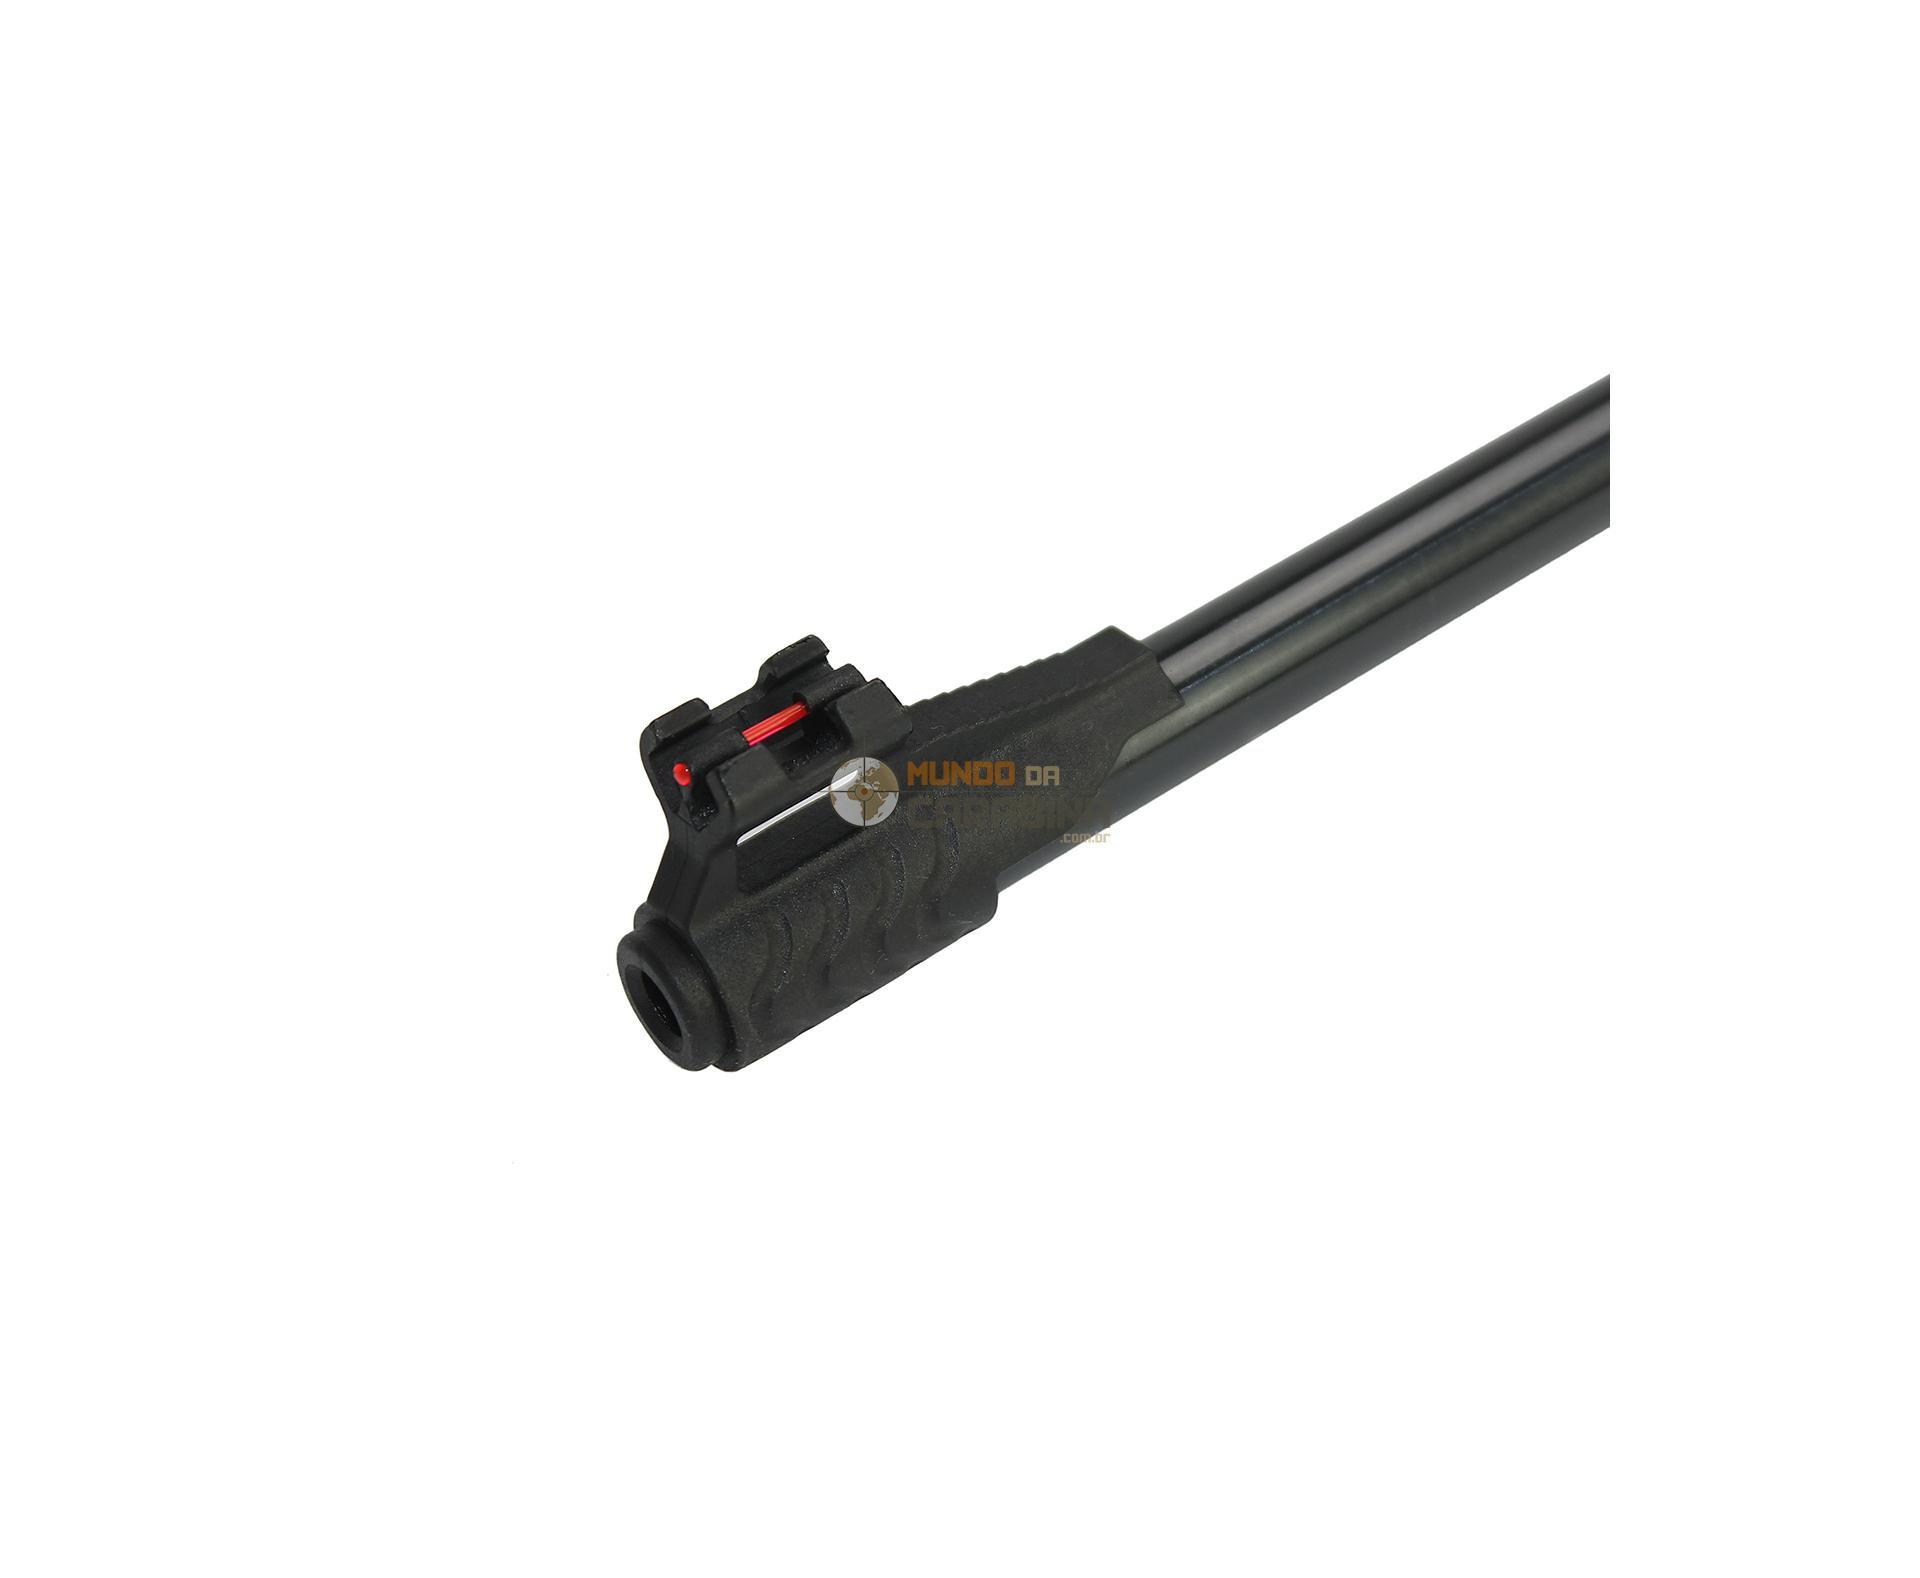 "Carabina De Pressão Hatsan Ht 80 - Calibre 4,5 Mm - Sistema Sas + Capa 45"""